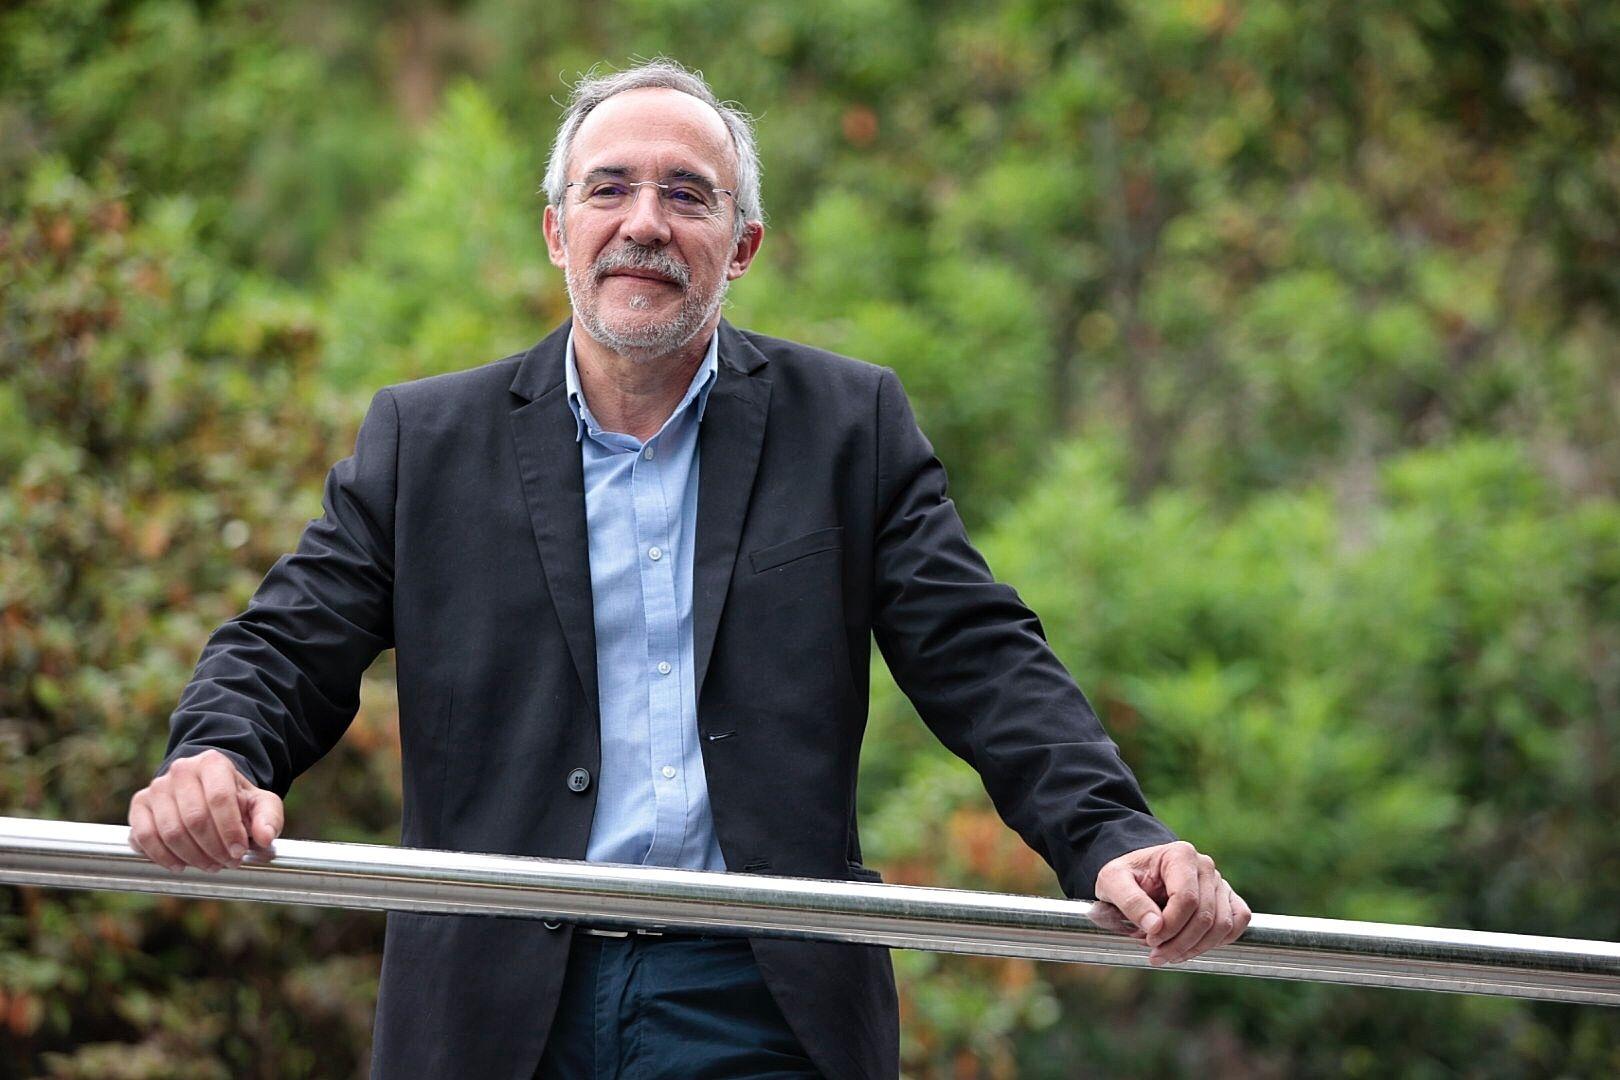 José Luis Esquivel